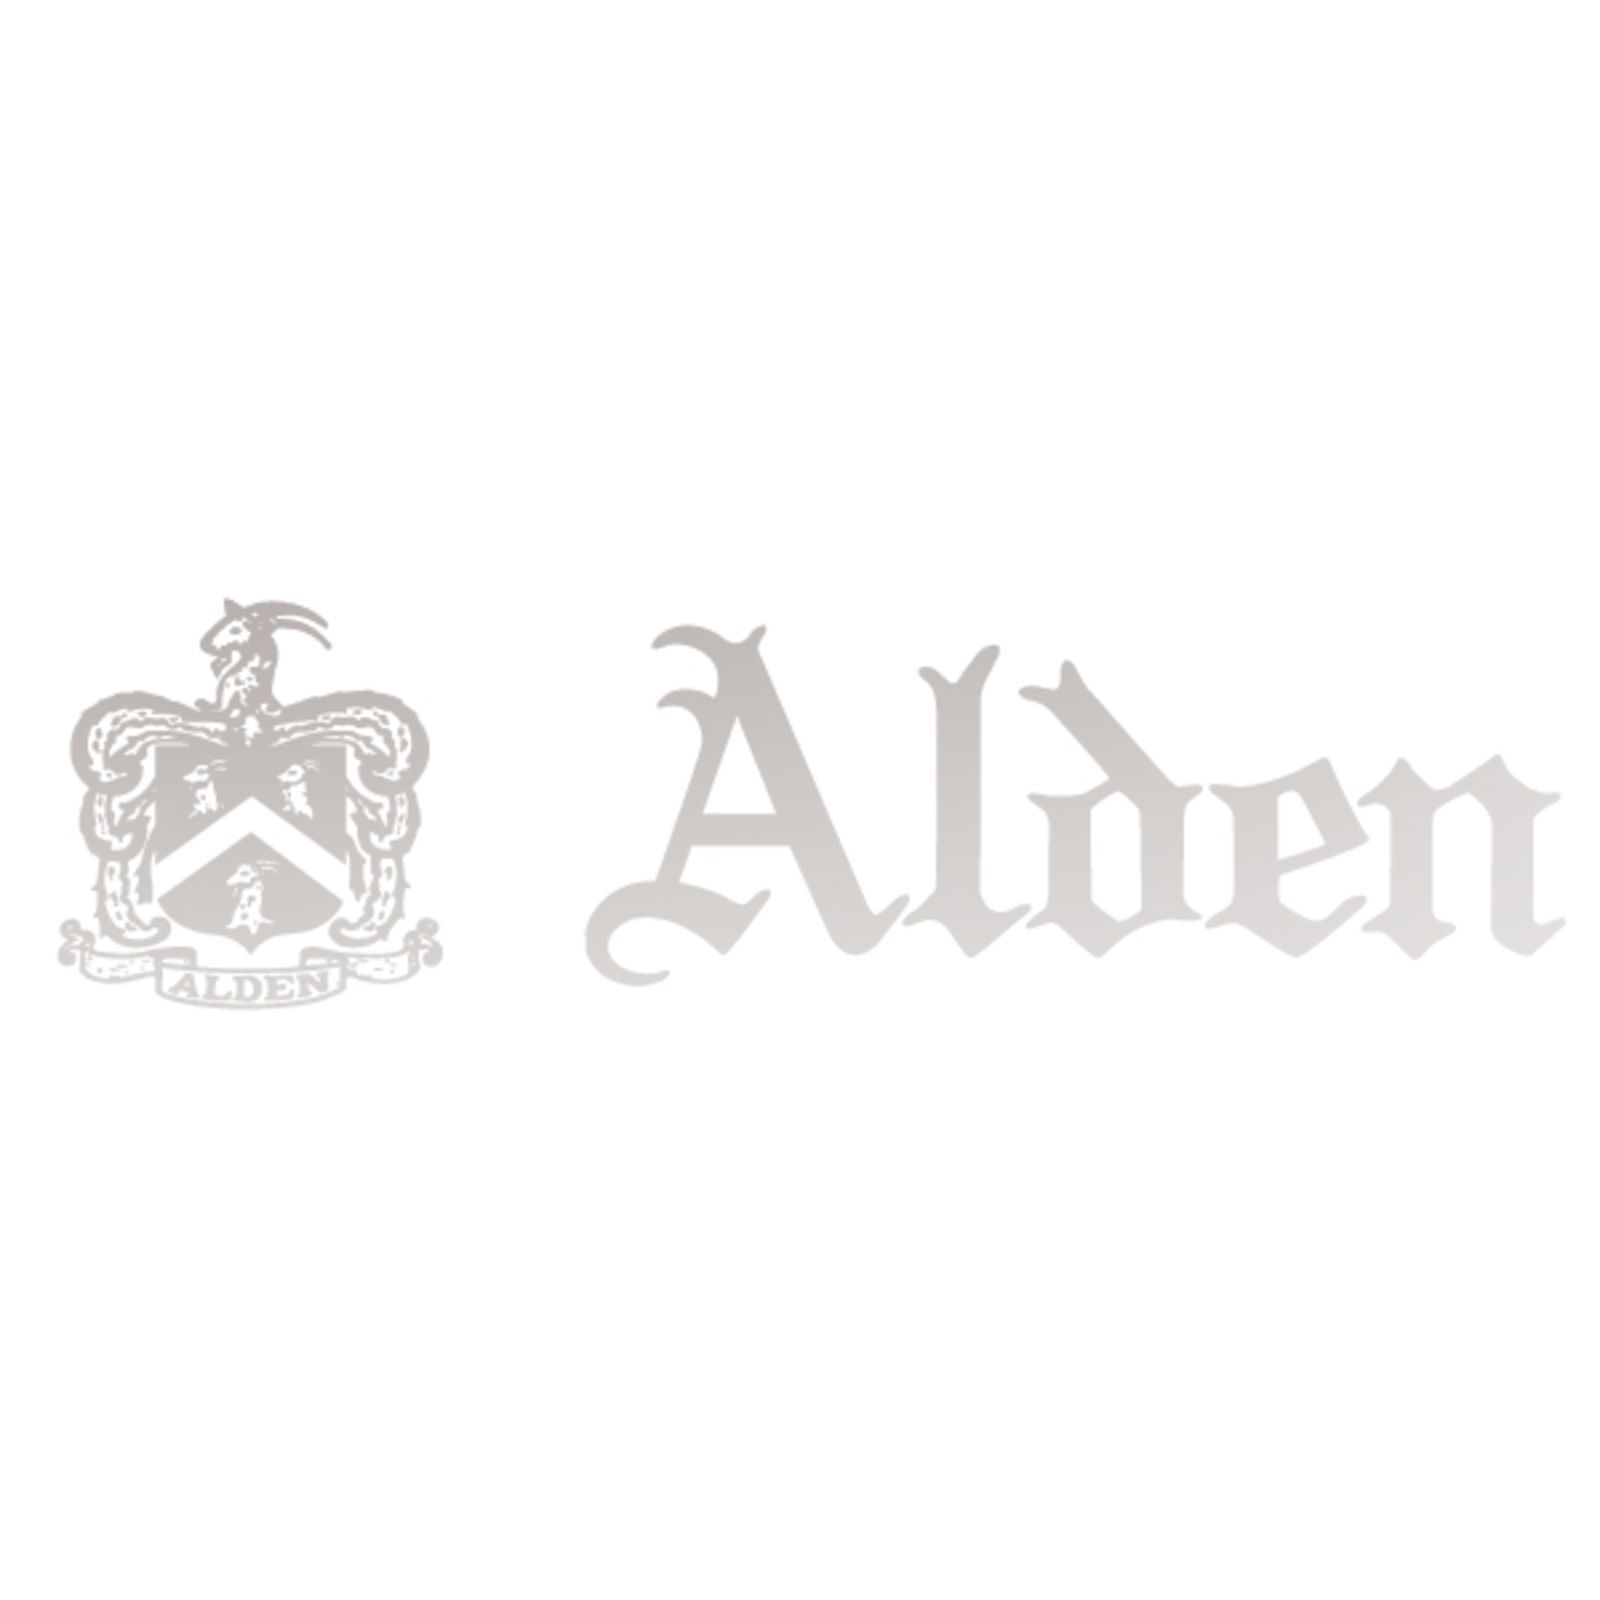 Alden (Bild 1)